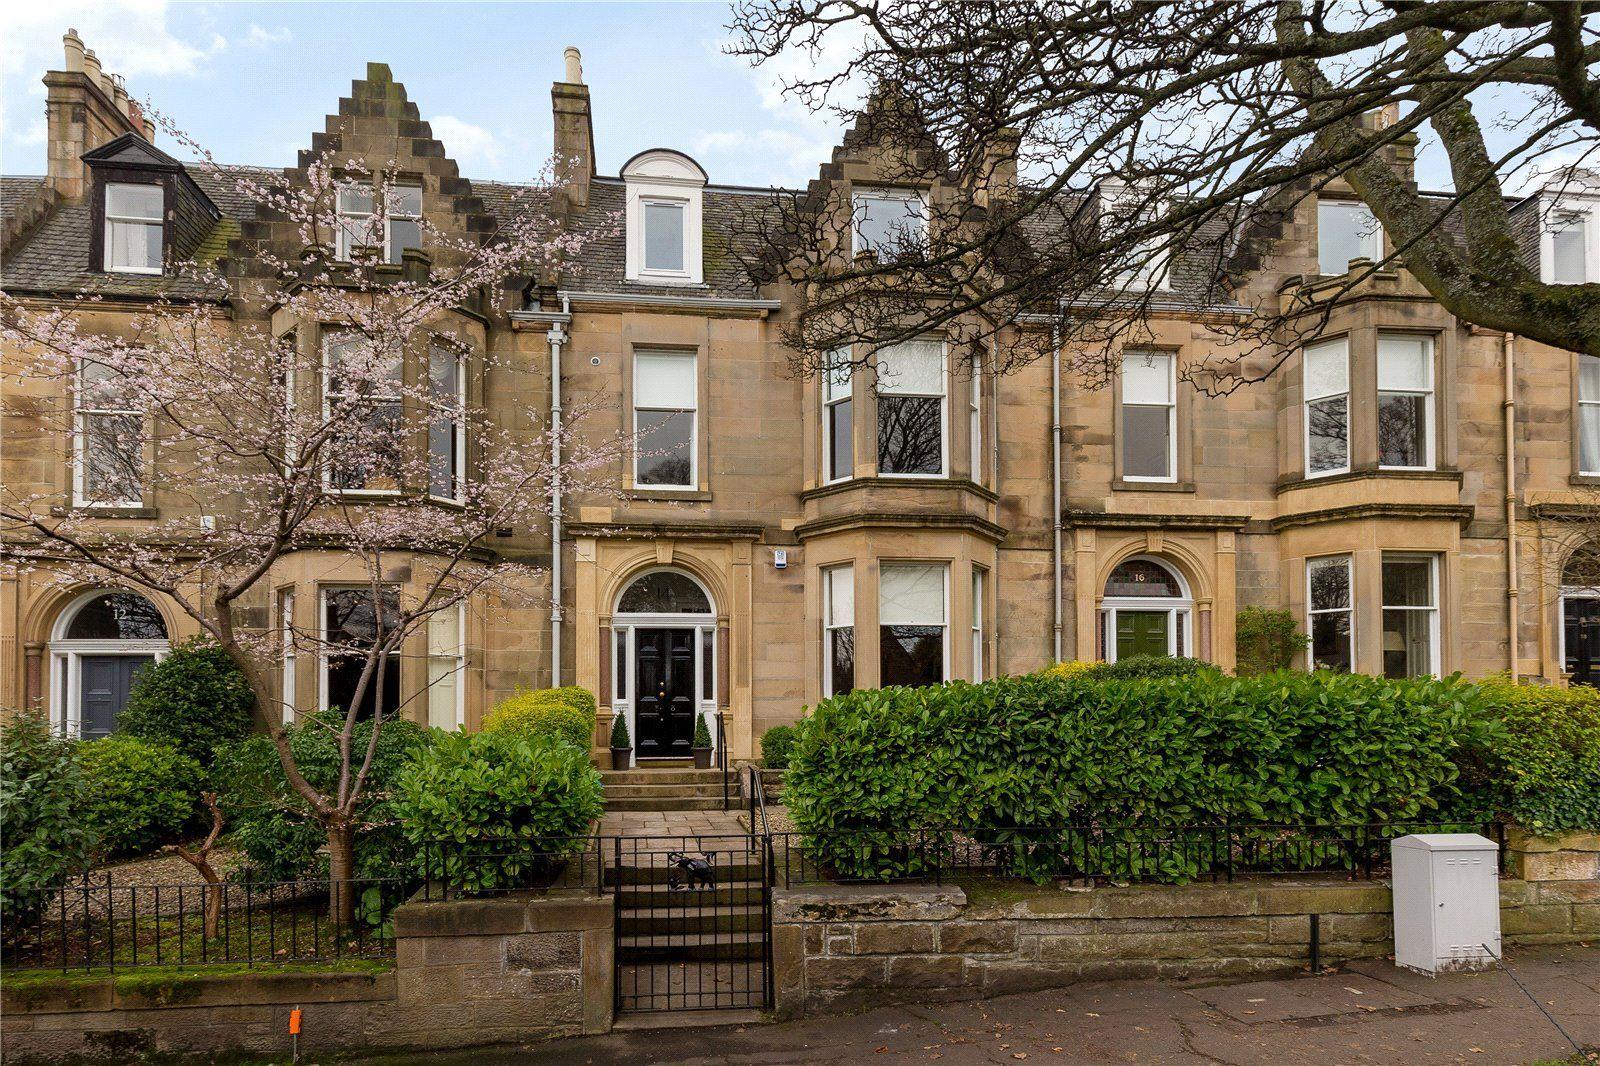 14 1 Murrayfield Avenue Property For Sale House Styles Edinburgh